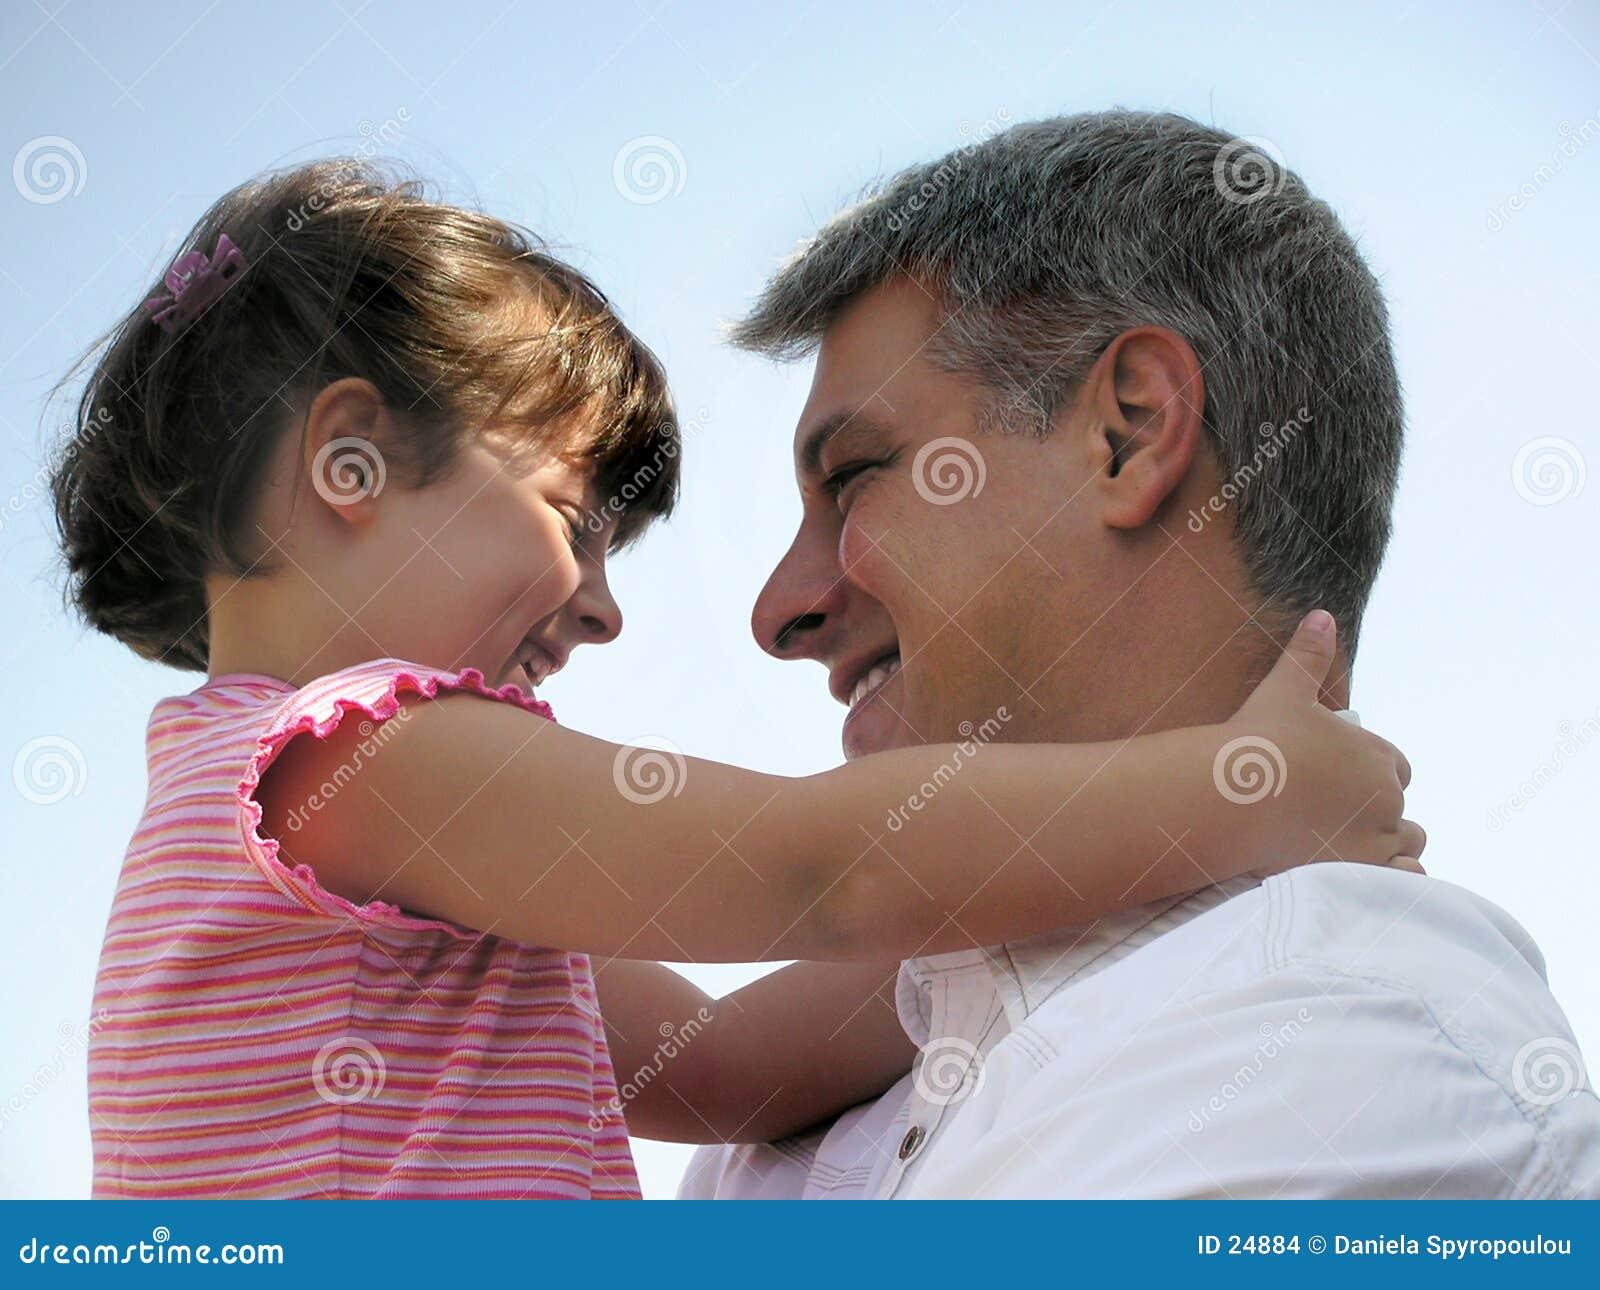 Download μεγάλο αγκάλιασμα στοκ εικόνες. εικόνα από συναισθηματικός - 24884